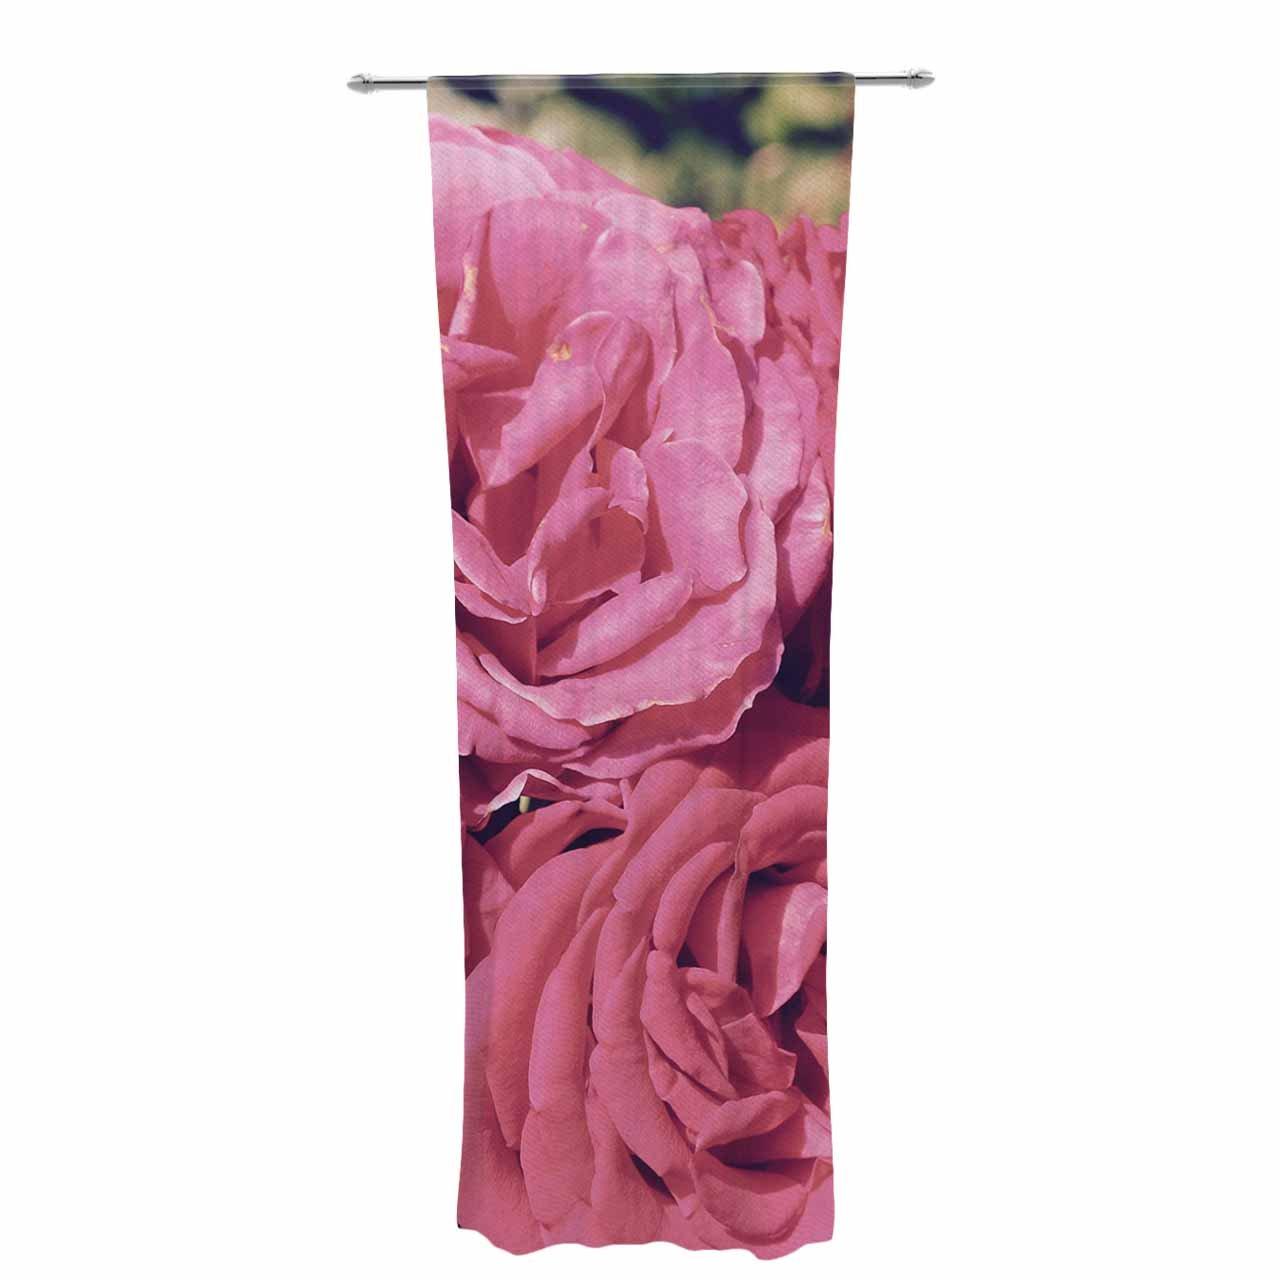 Kess InHouse Susan Sanders Blush Pink Blooming Roses Floral Photography Decorative Set, 30' x 84' Sheer Curtains